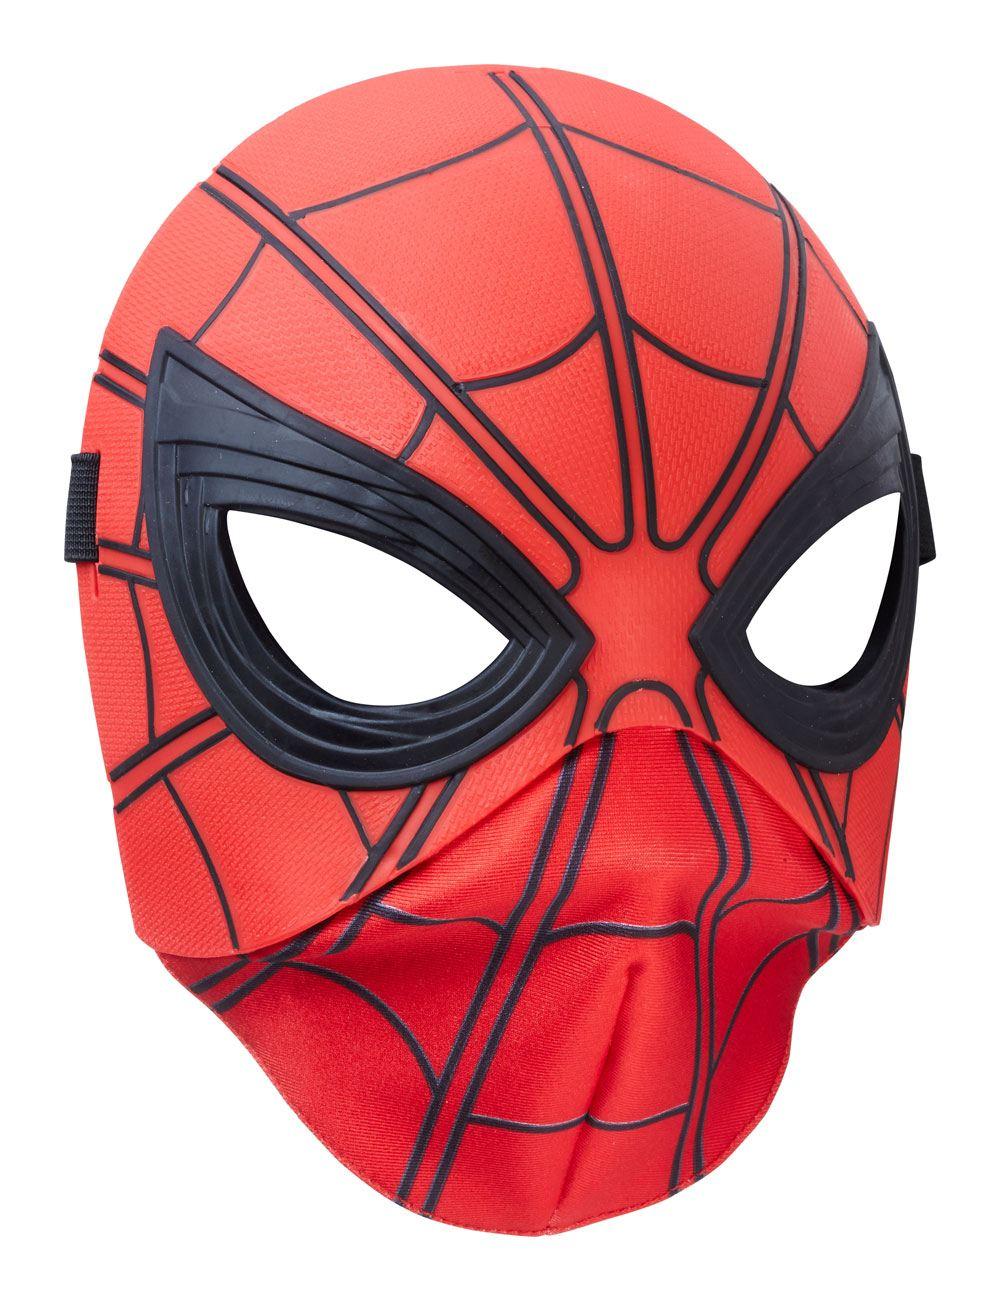 Spider-Man Homecoming Flip-Up Mask Spider-Man